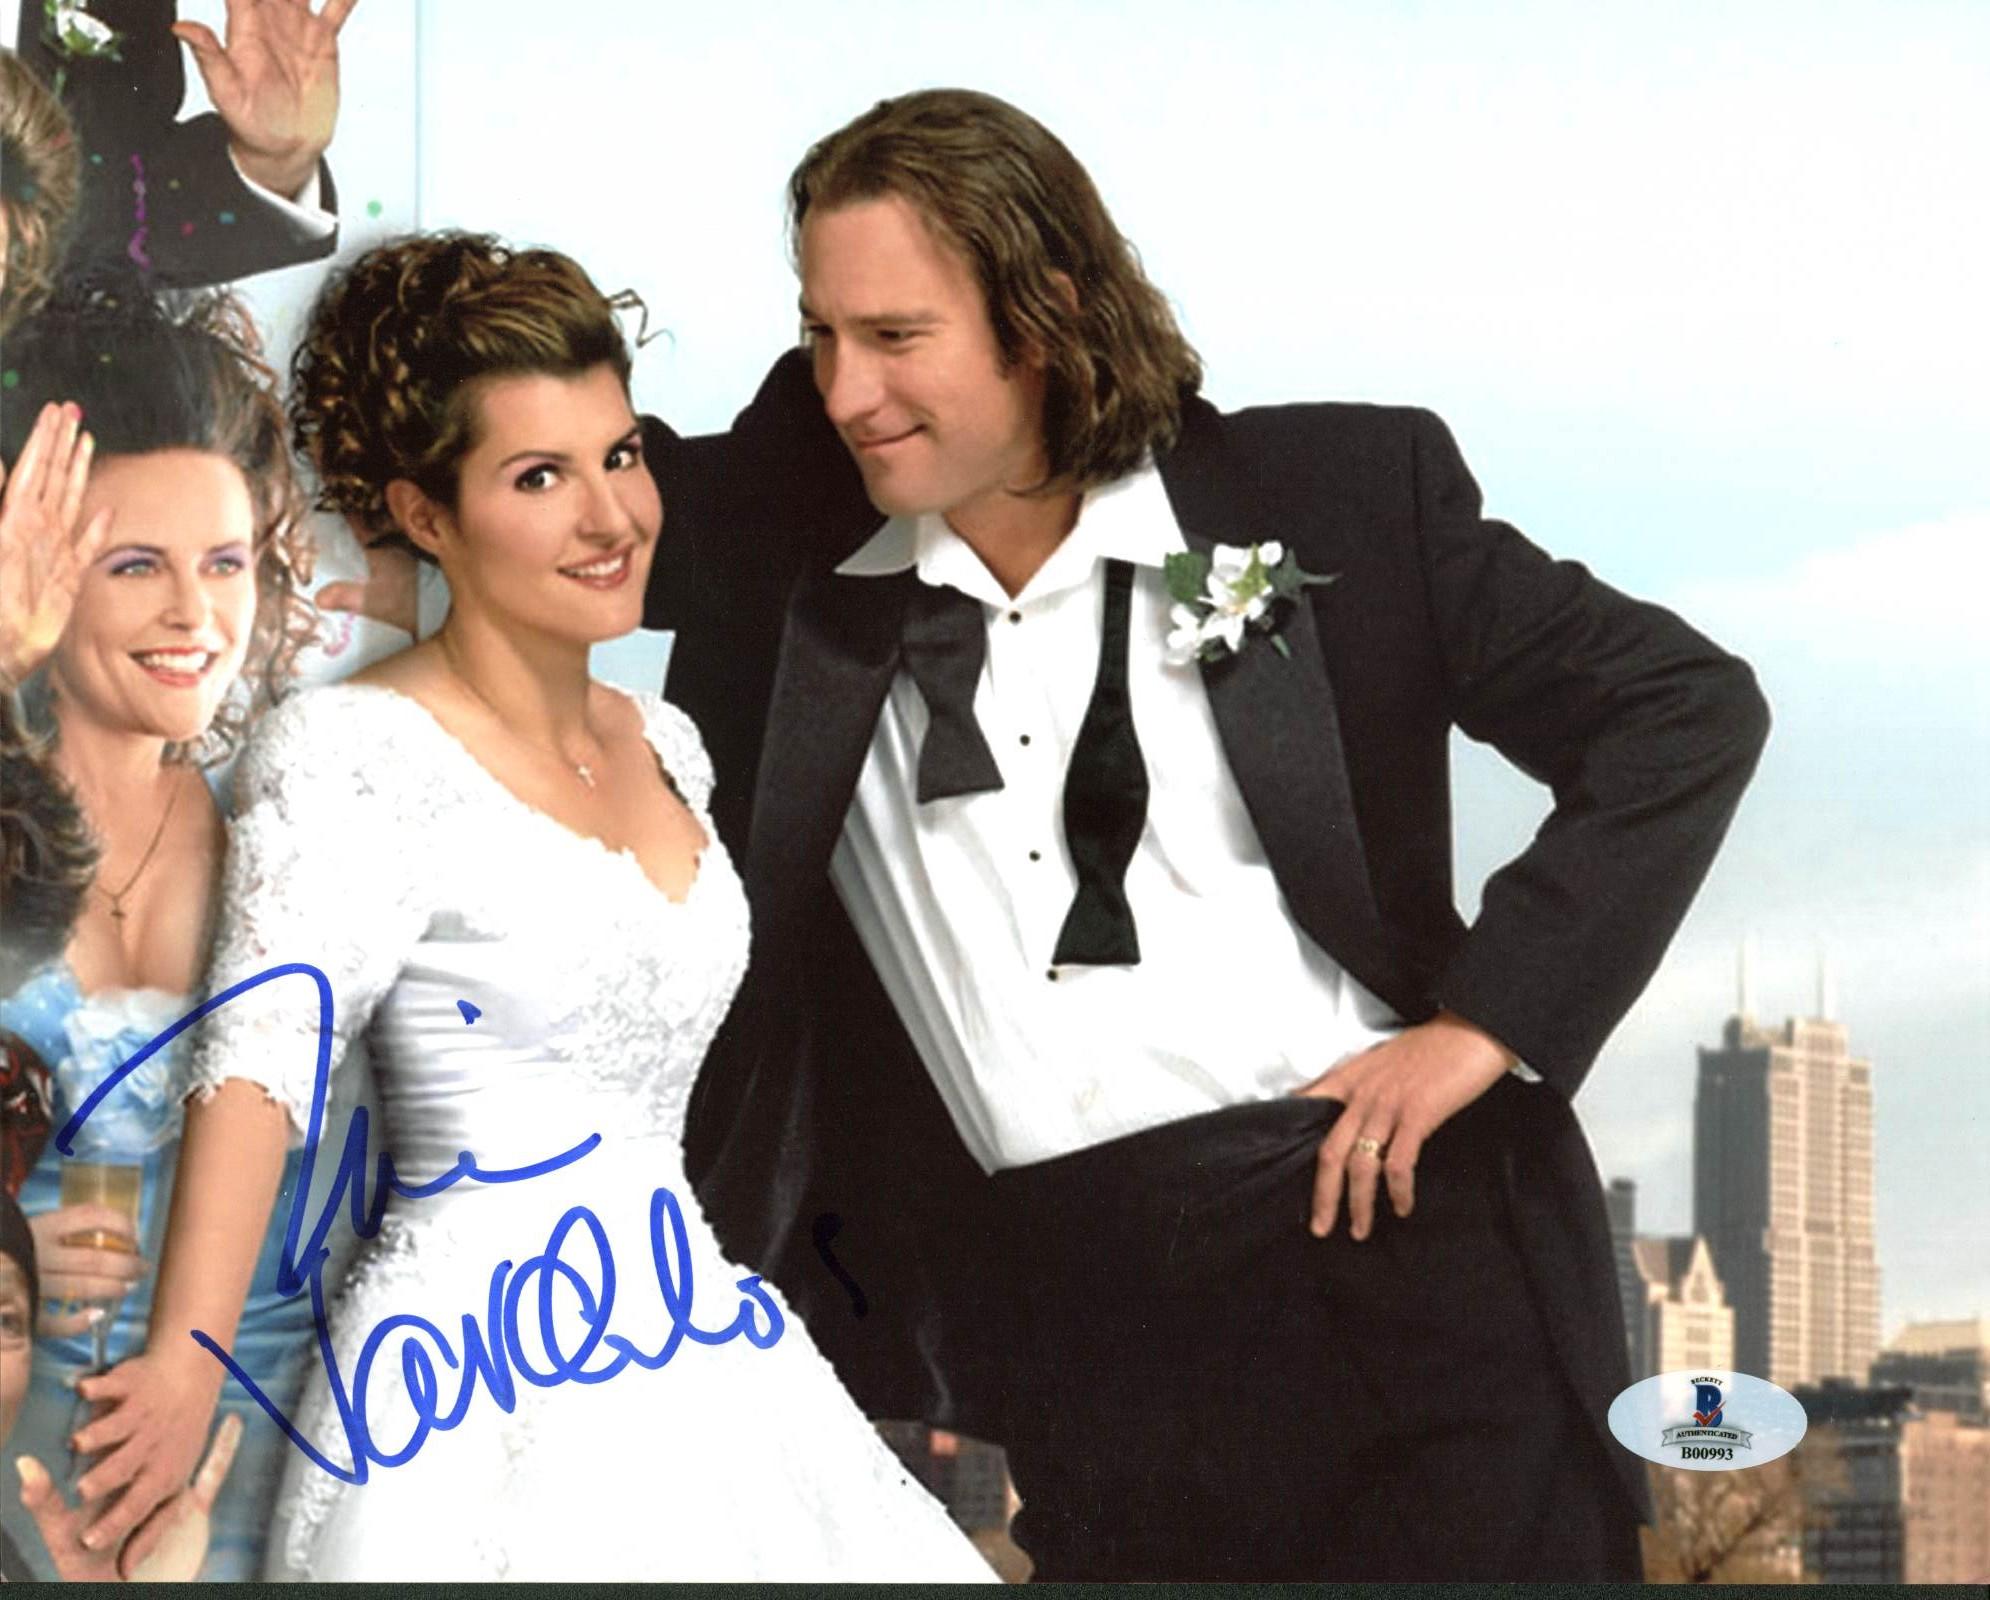 Nia Vardalos My Big Fat Greek Wedding Authentic Signed 8X10 Photo BAS #B00993